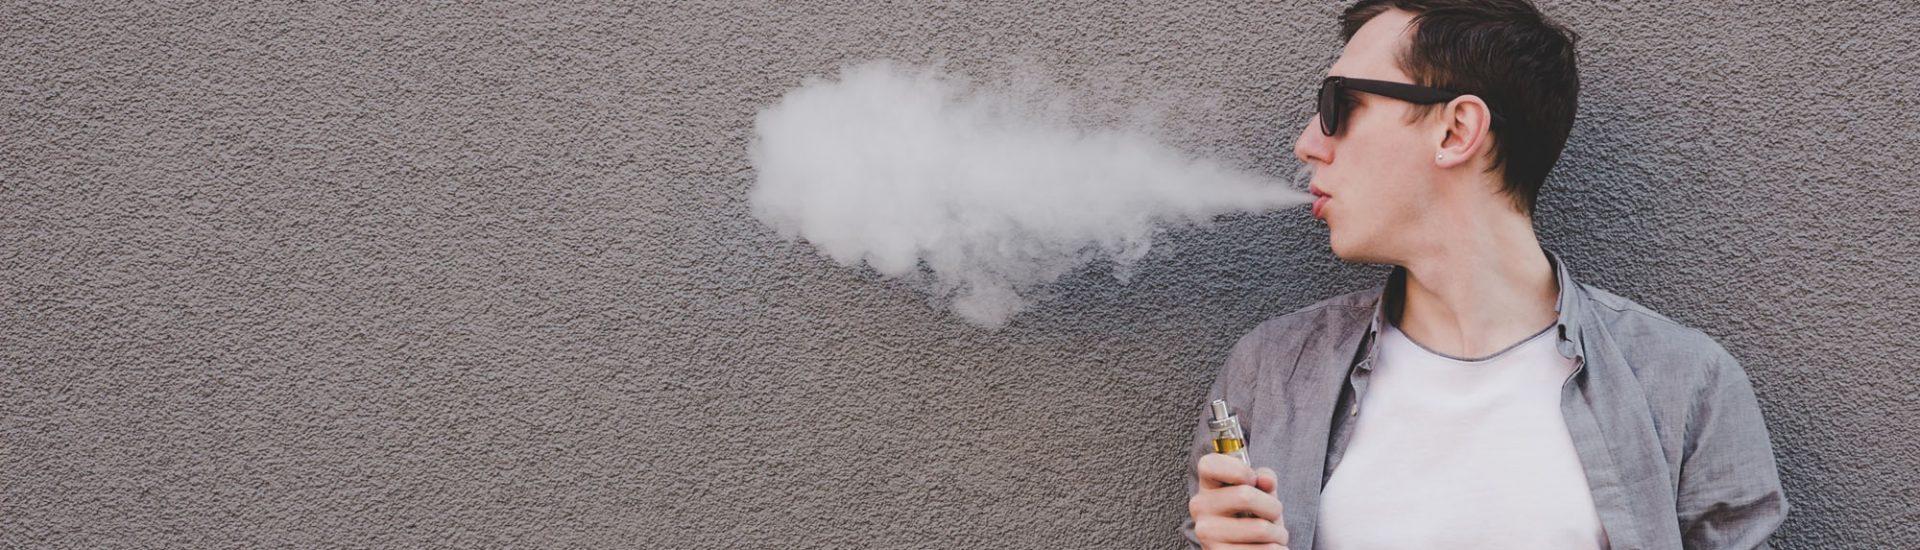 Aspire E-Zigaretten: Top 3 Modelle, Liquids, FAQ